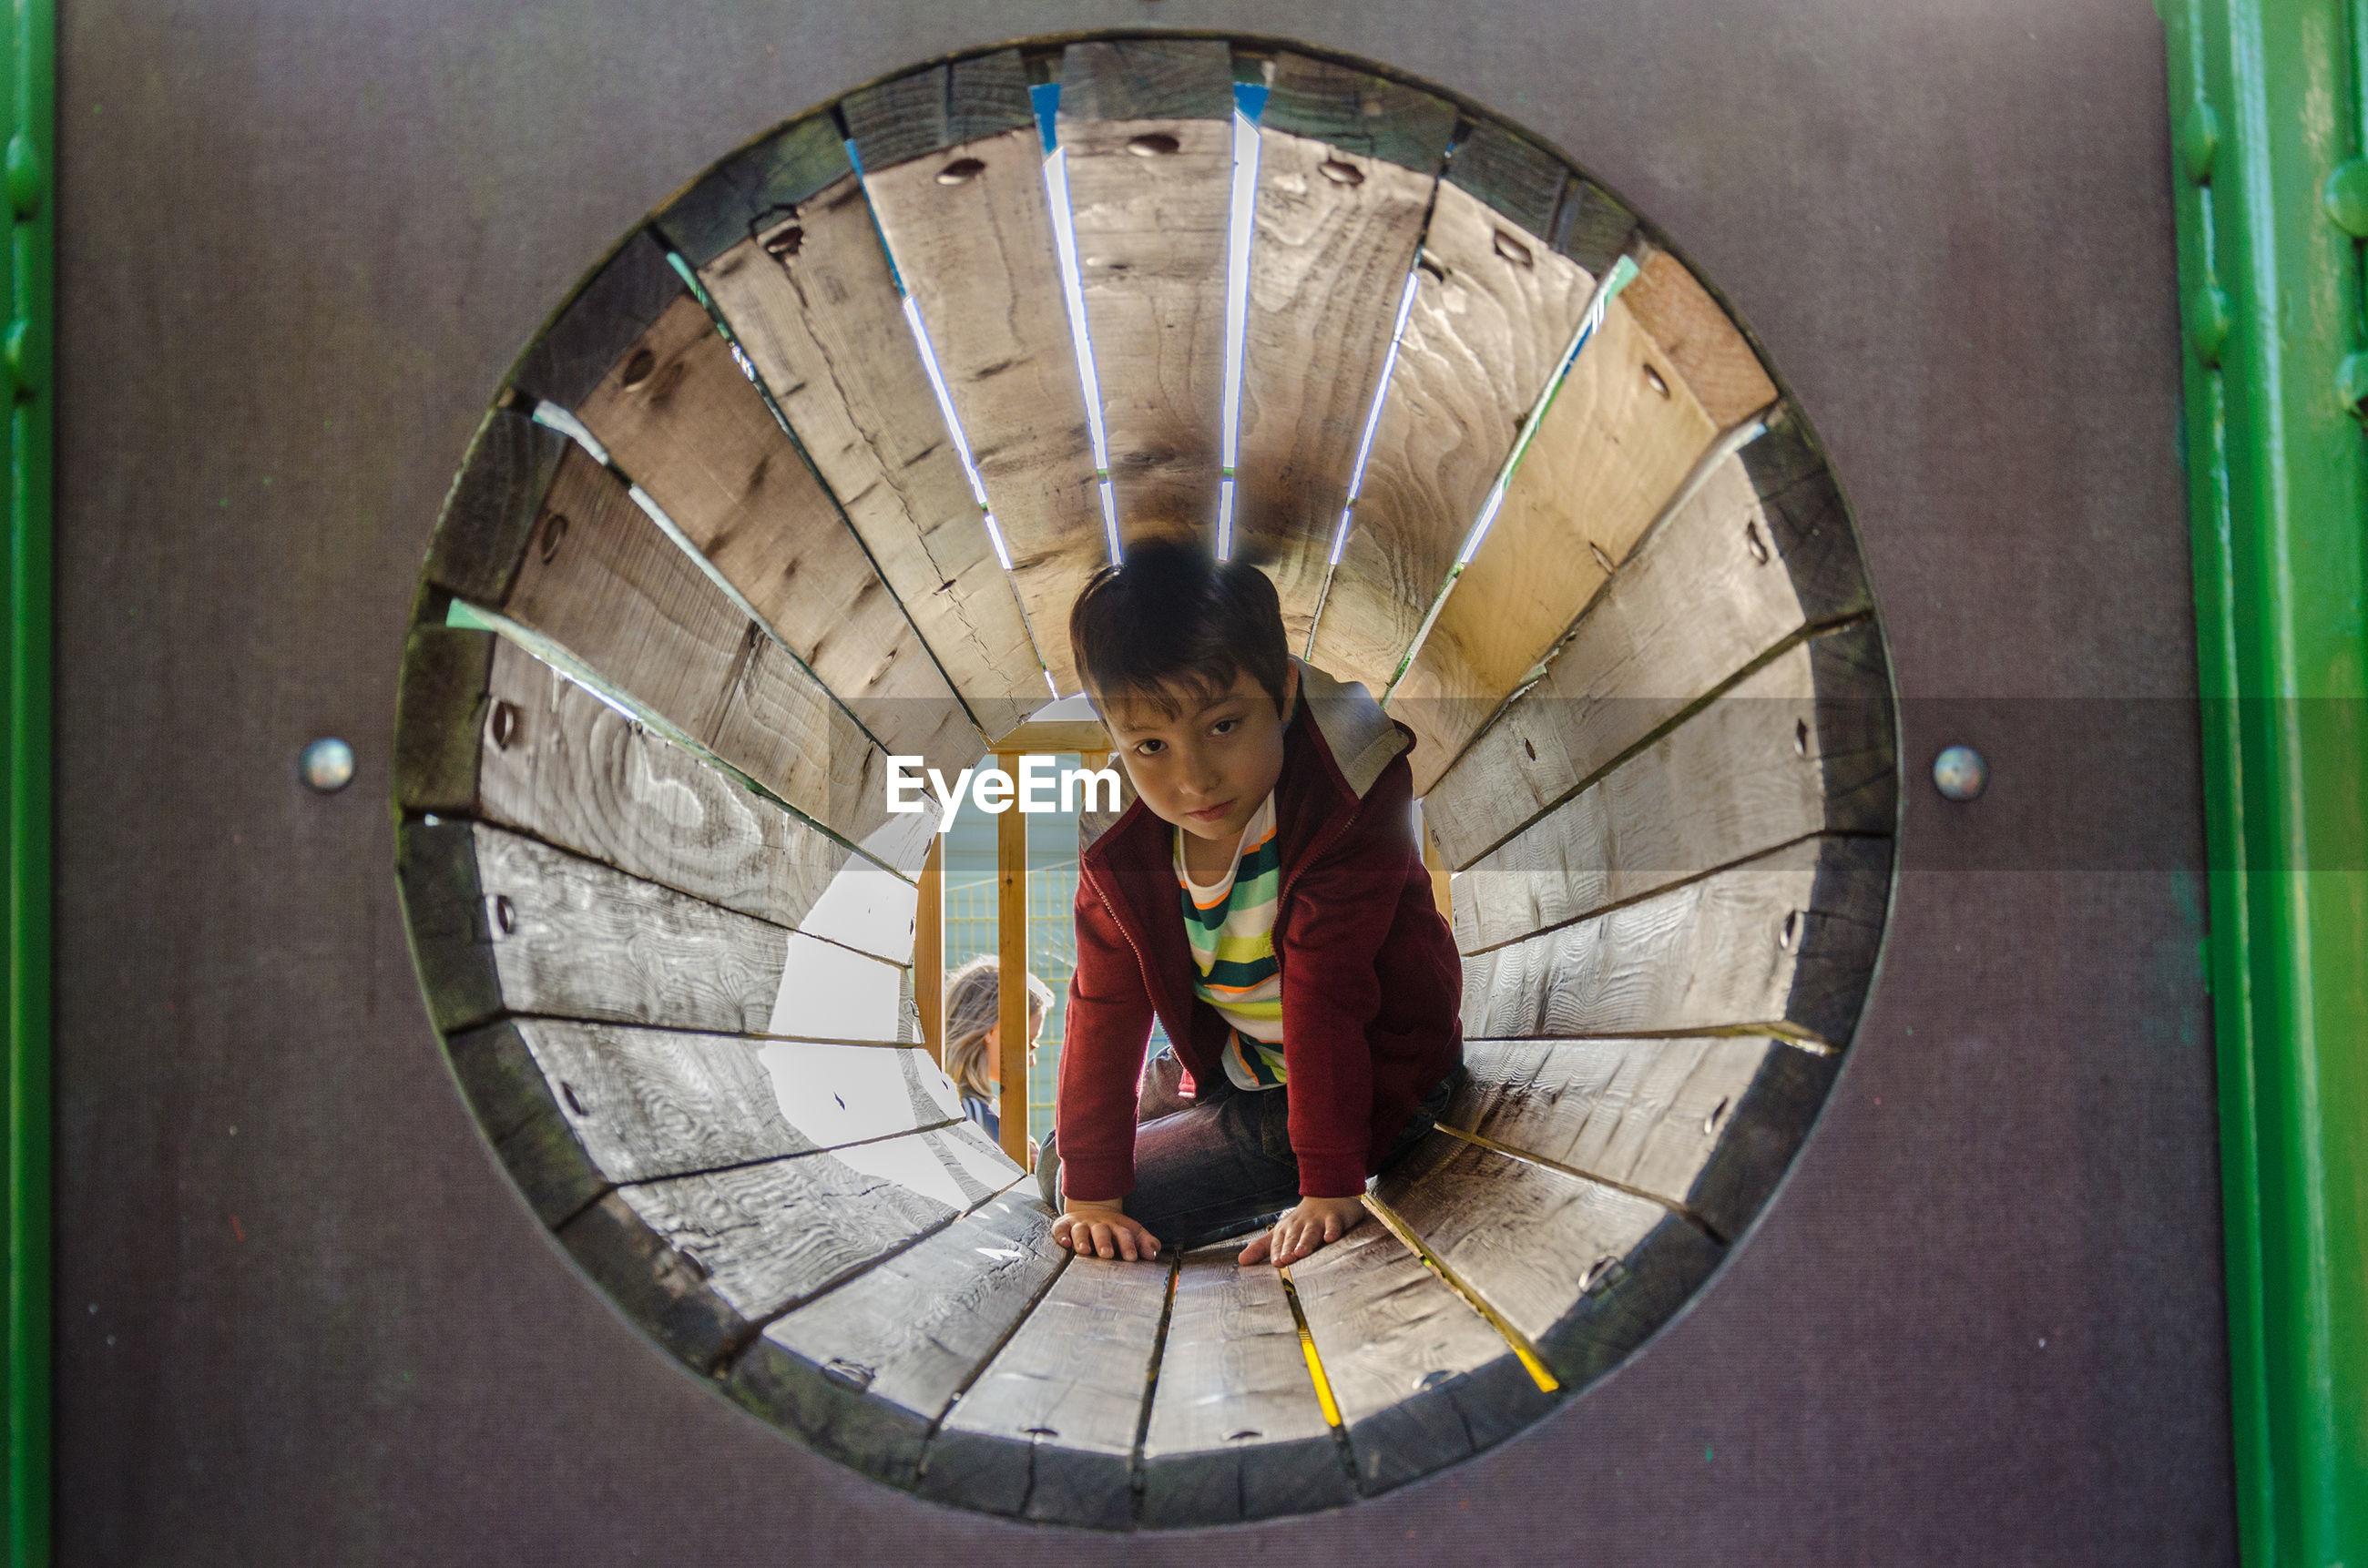 View of child playing on playground equipment